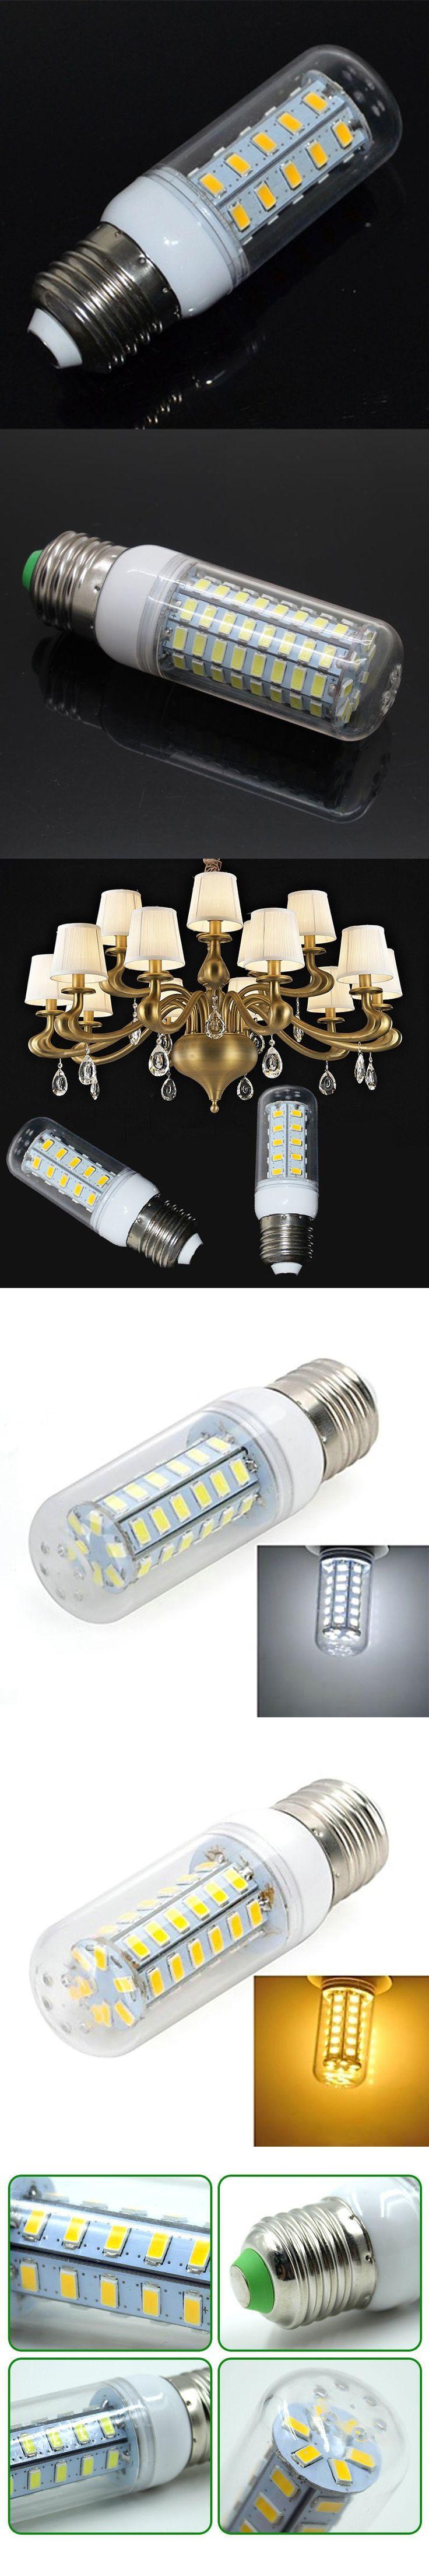 Ampolleta Led 220V E27 E14 LED Bulb Filament LED Lamp 24 36 48 56 69 LEDs SMD5730 Lampadine Led Lights For Home Decoration $1.57